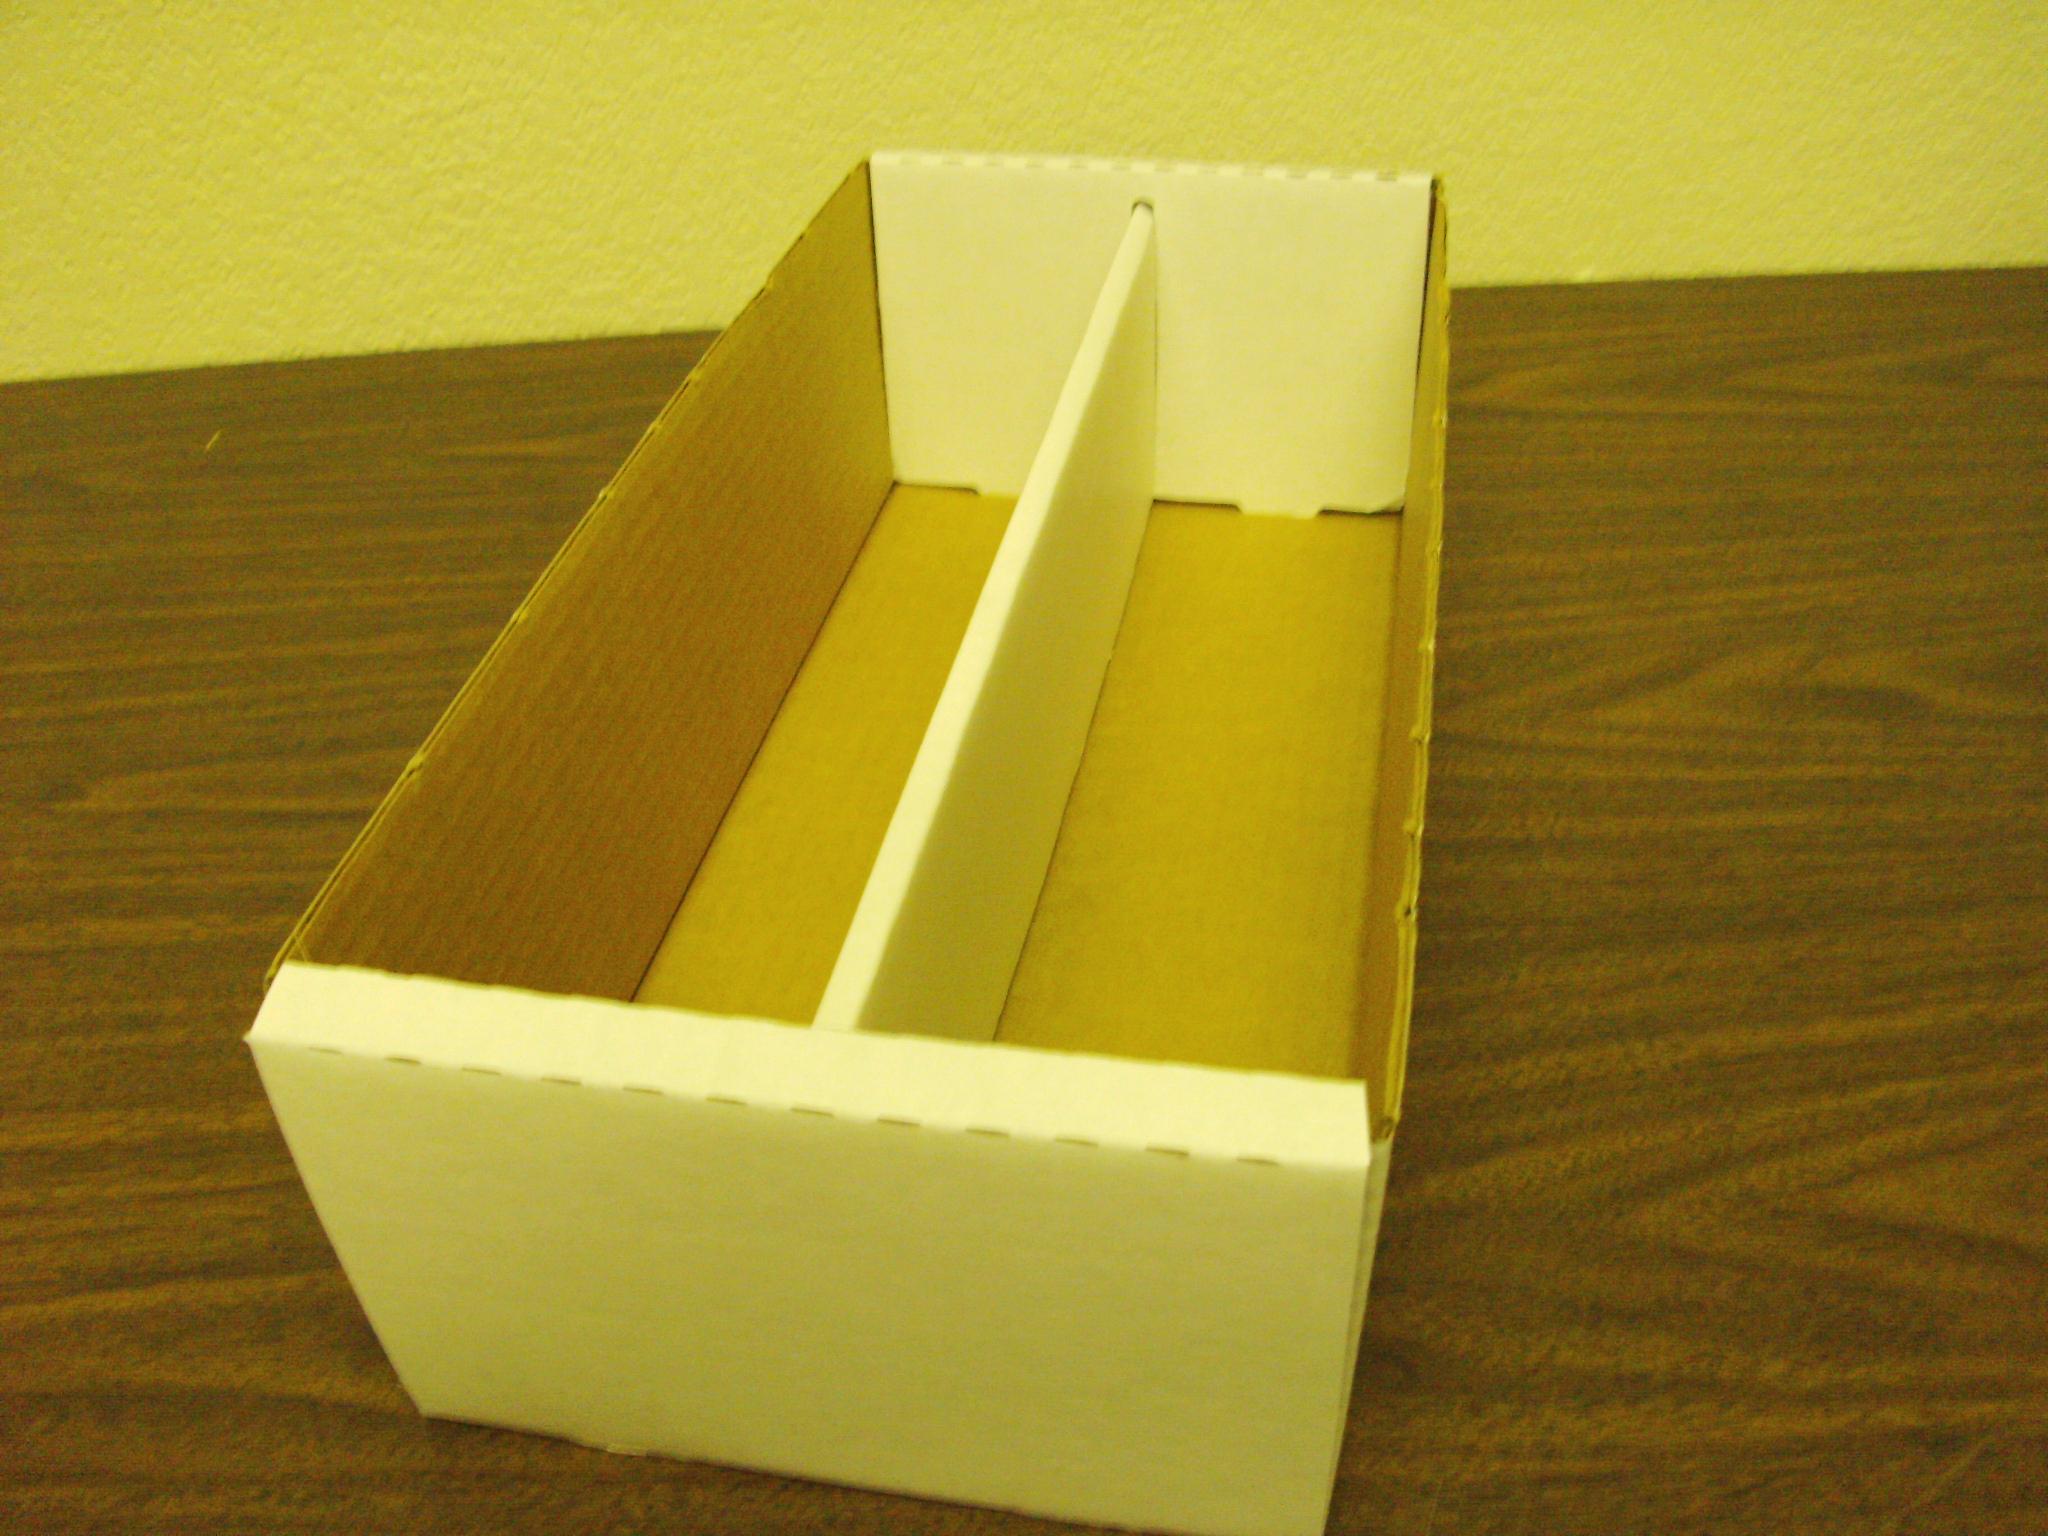 2000 ct Card Storage Box (Shoe Box)